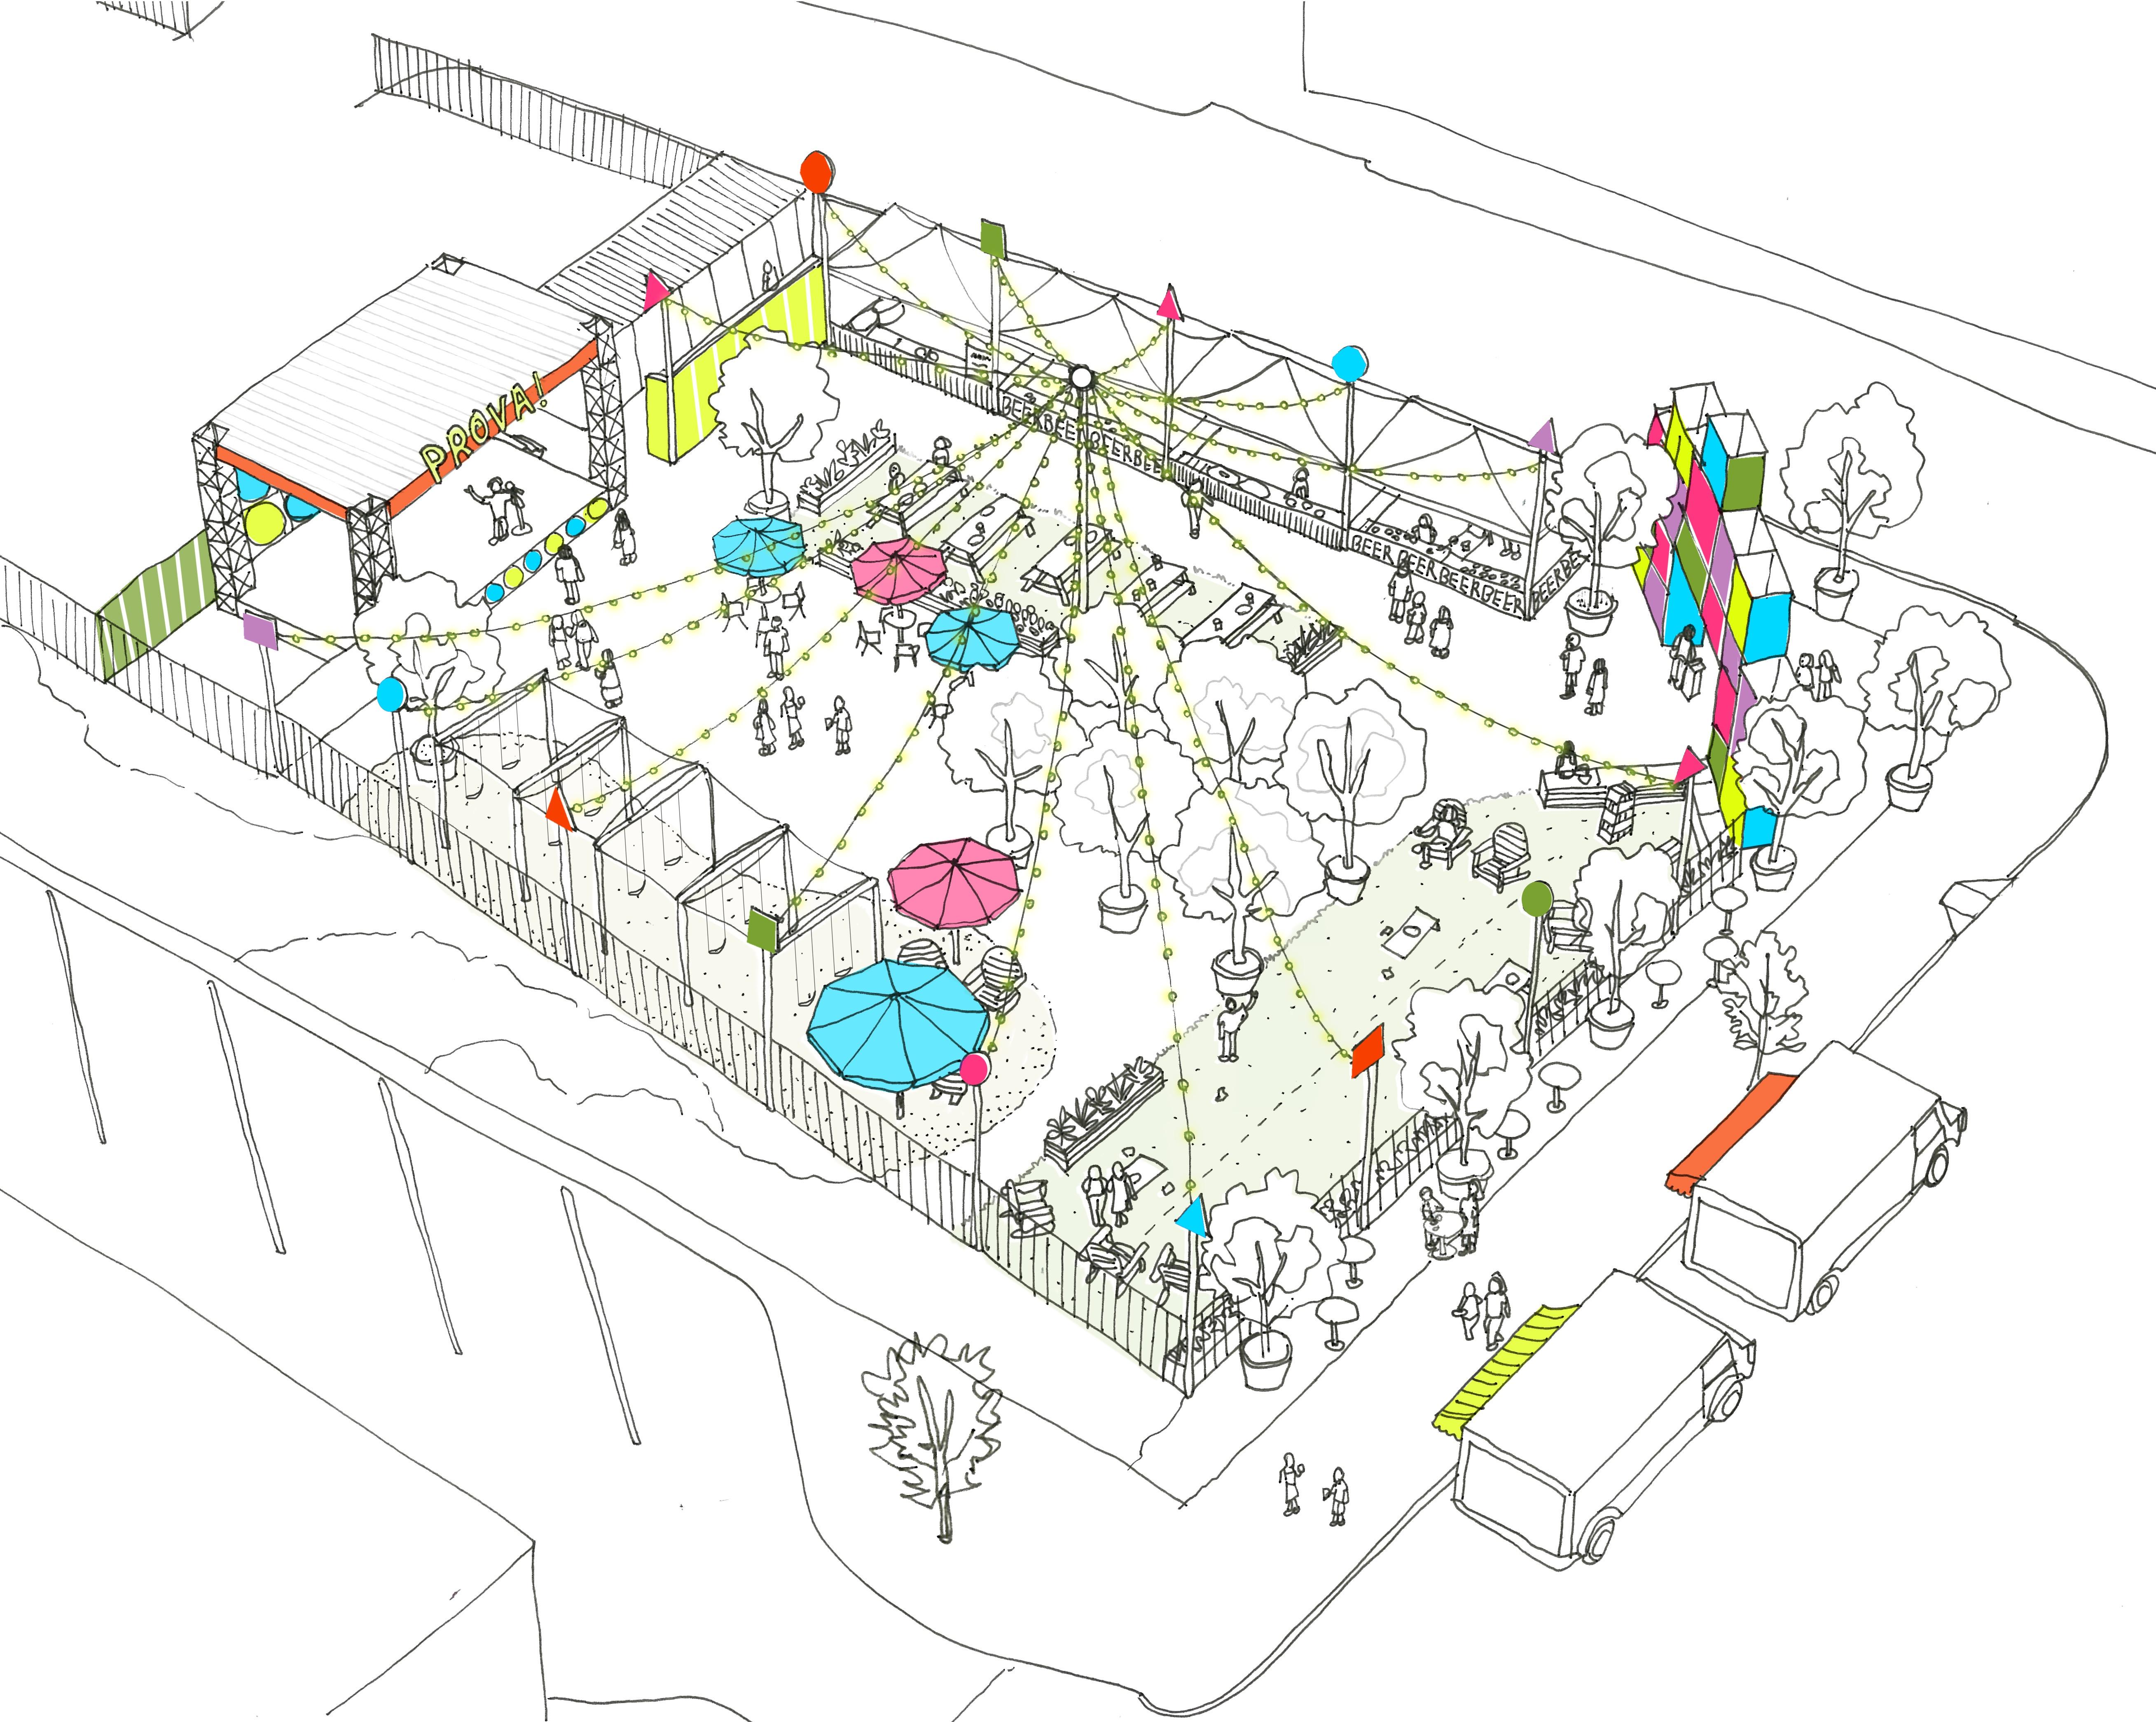 Utile's PROVA beer garden concept comes to life in Brockton!